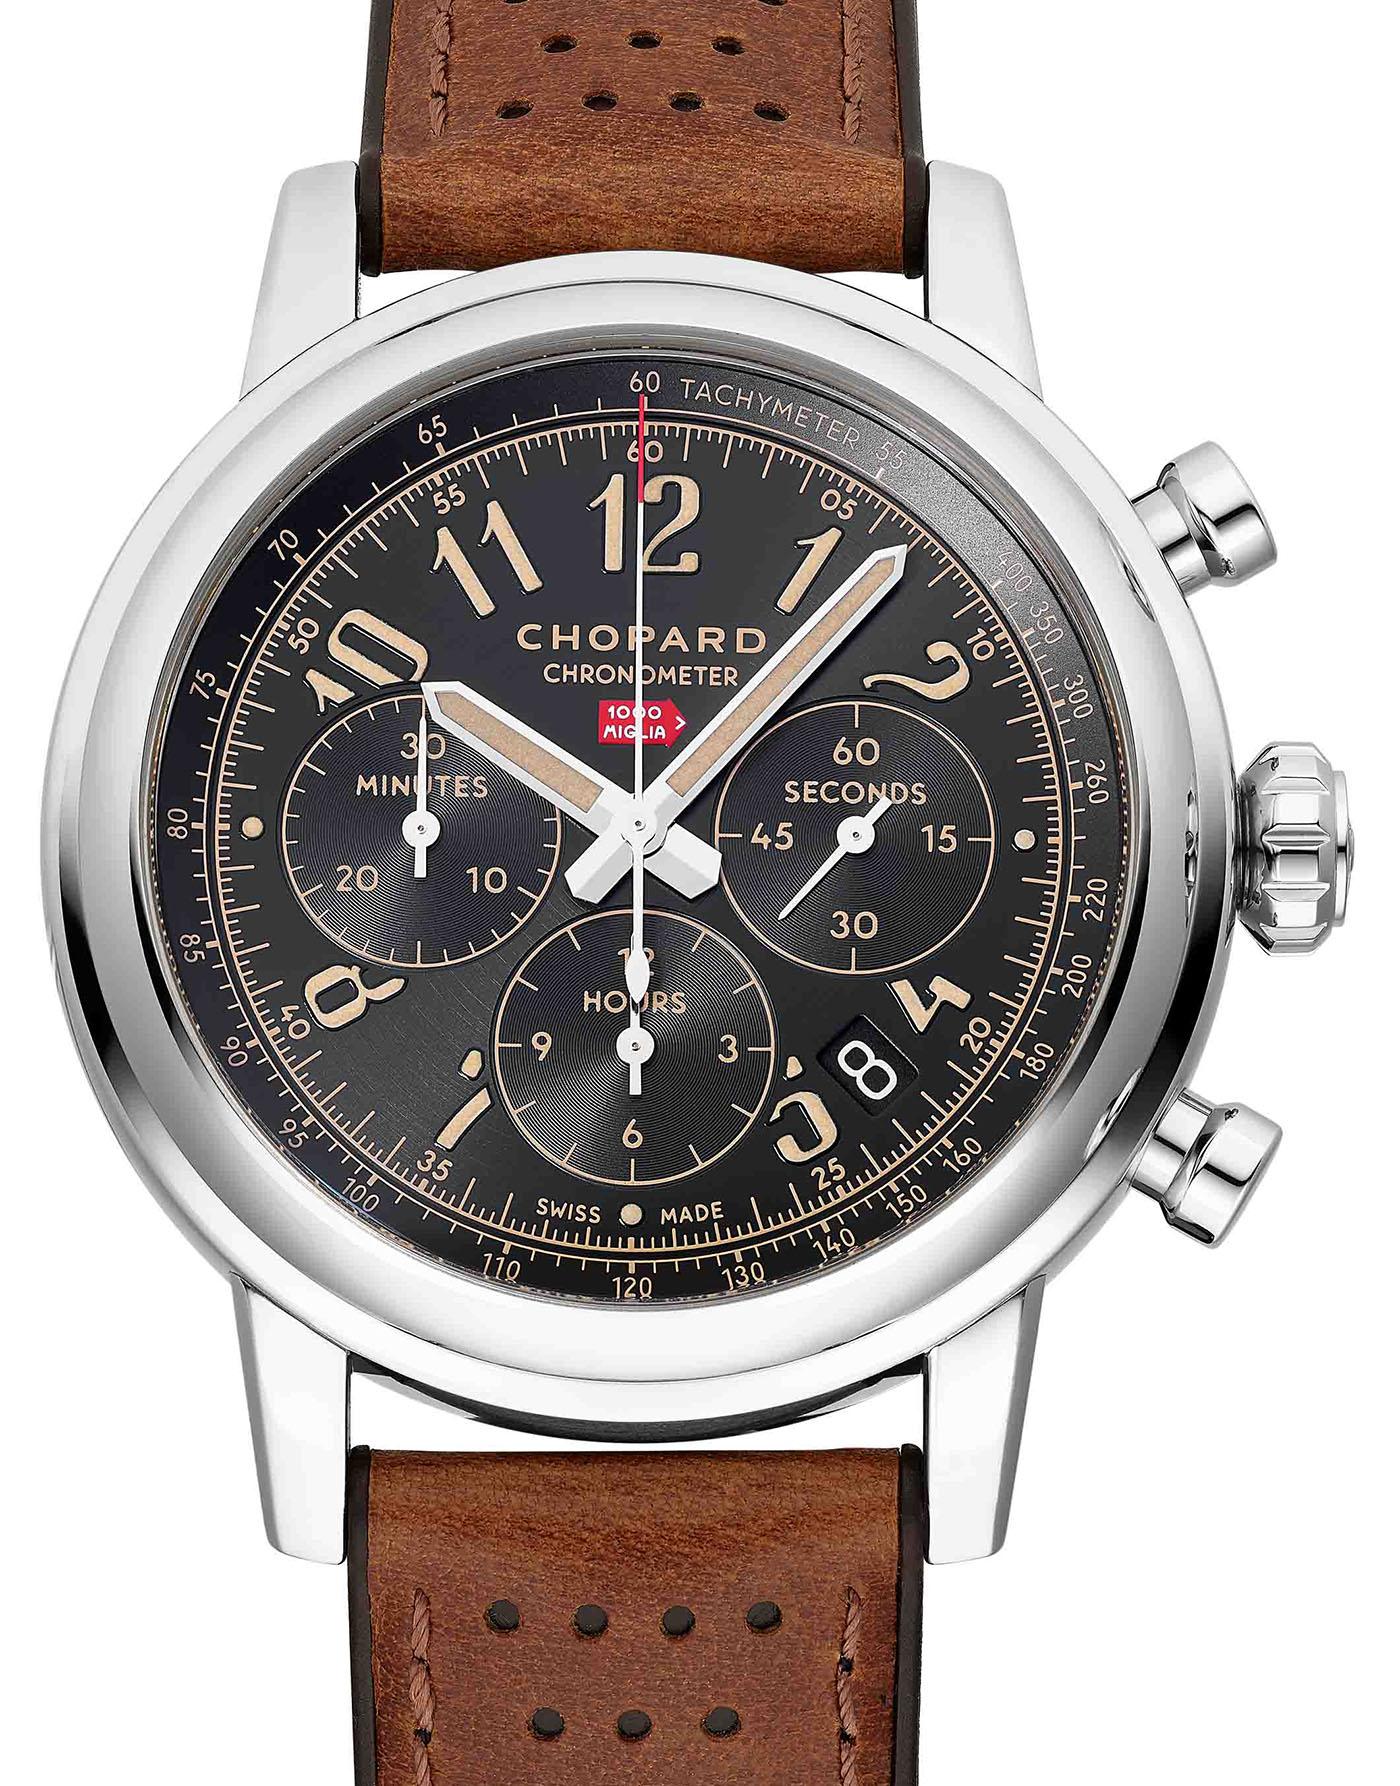 Chopard выпускает ограниченную серию часов Mille Miglia Classic Chronograph Raticosa